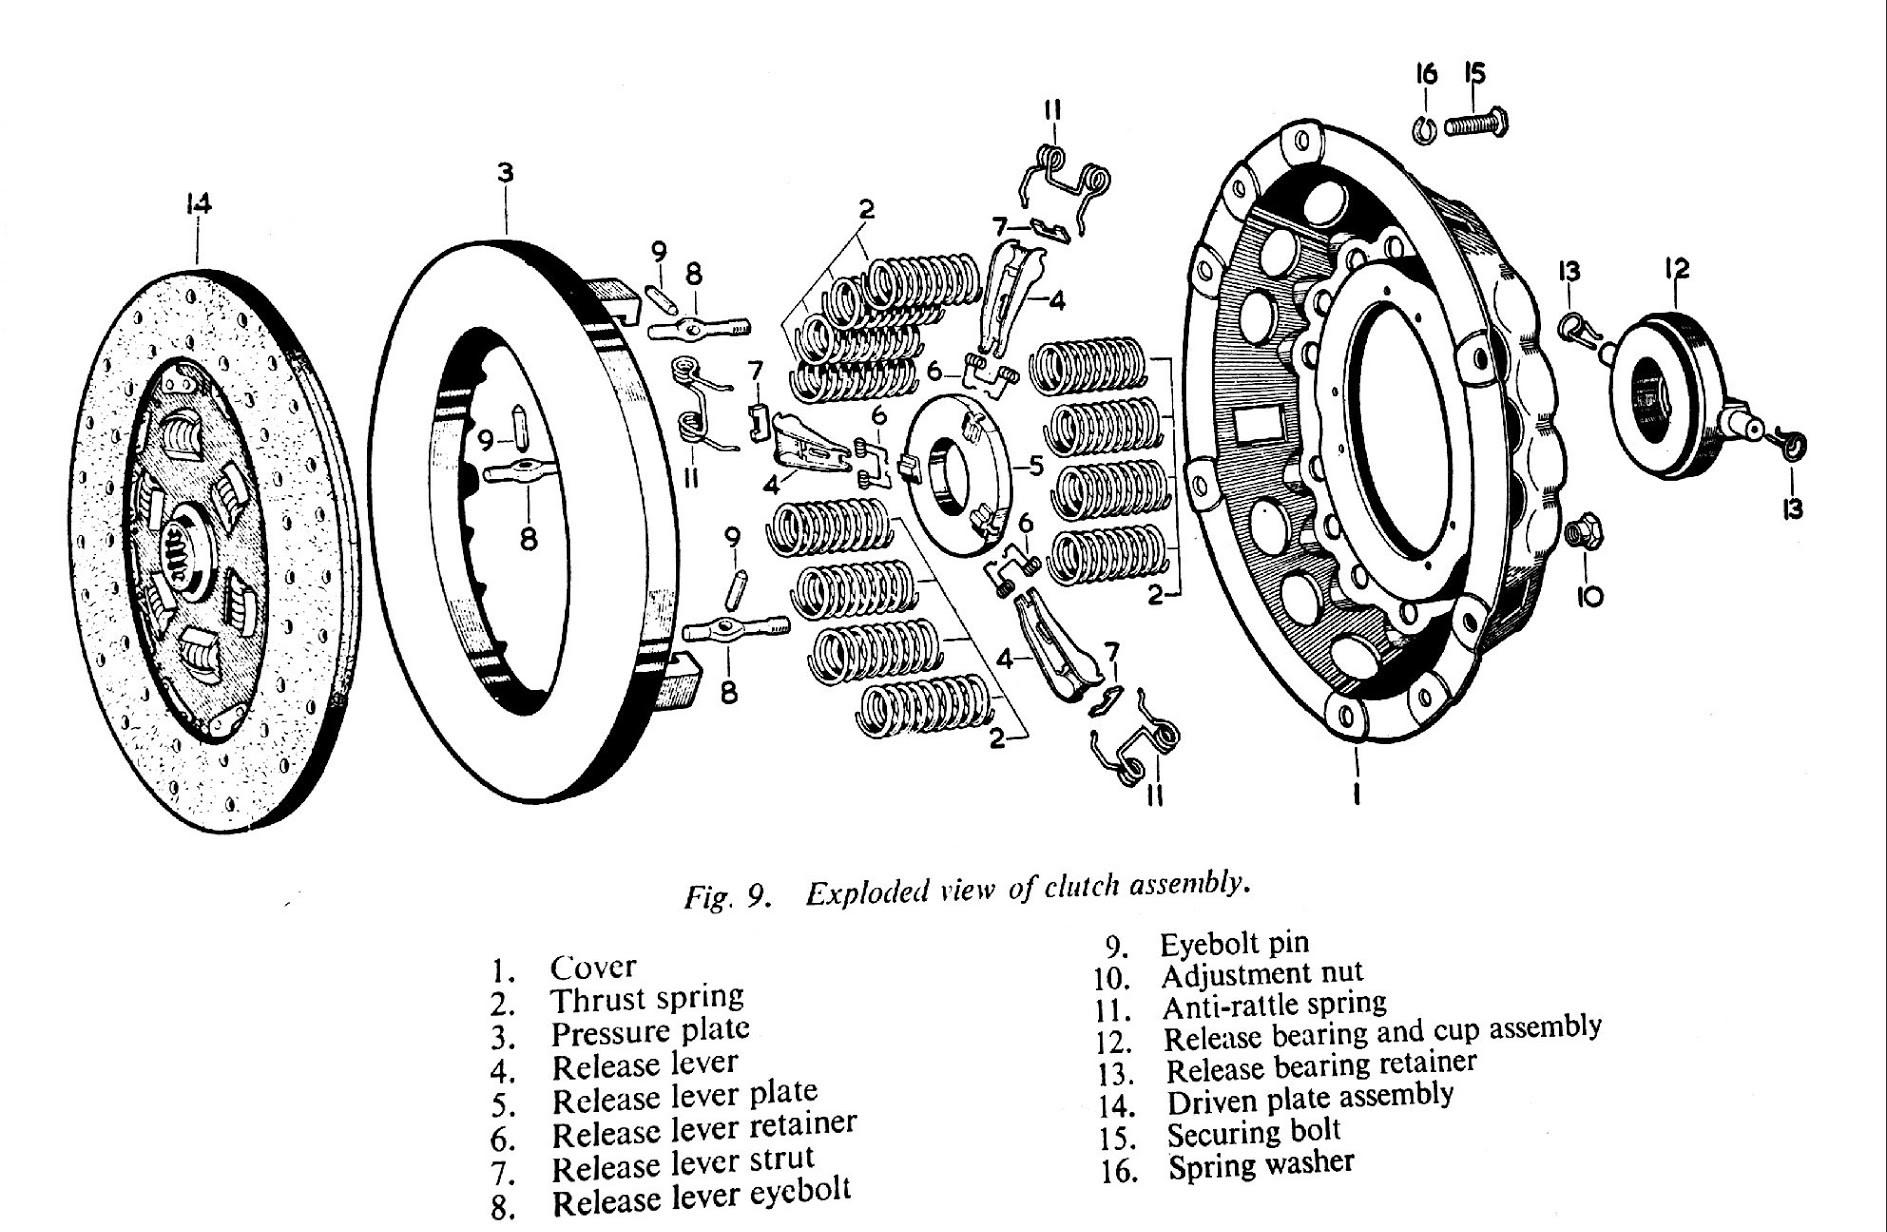 Manual Transmission Clutch Diagram